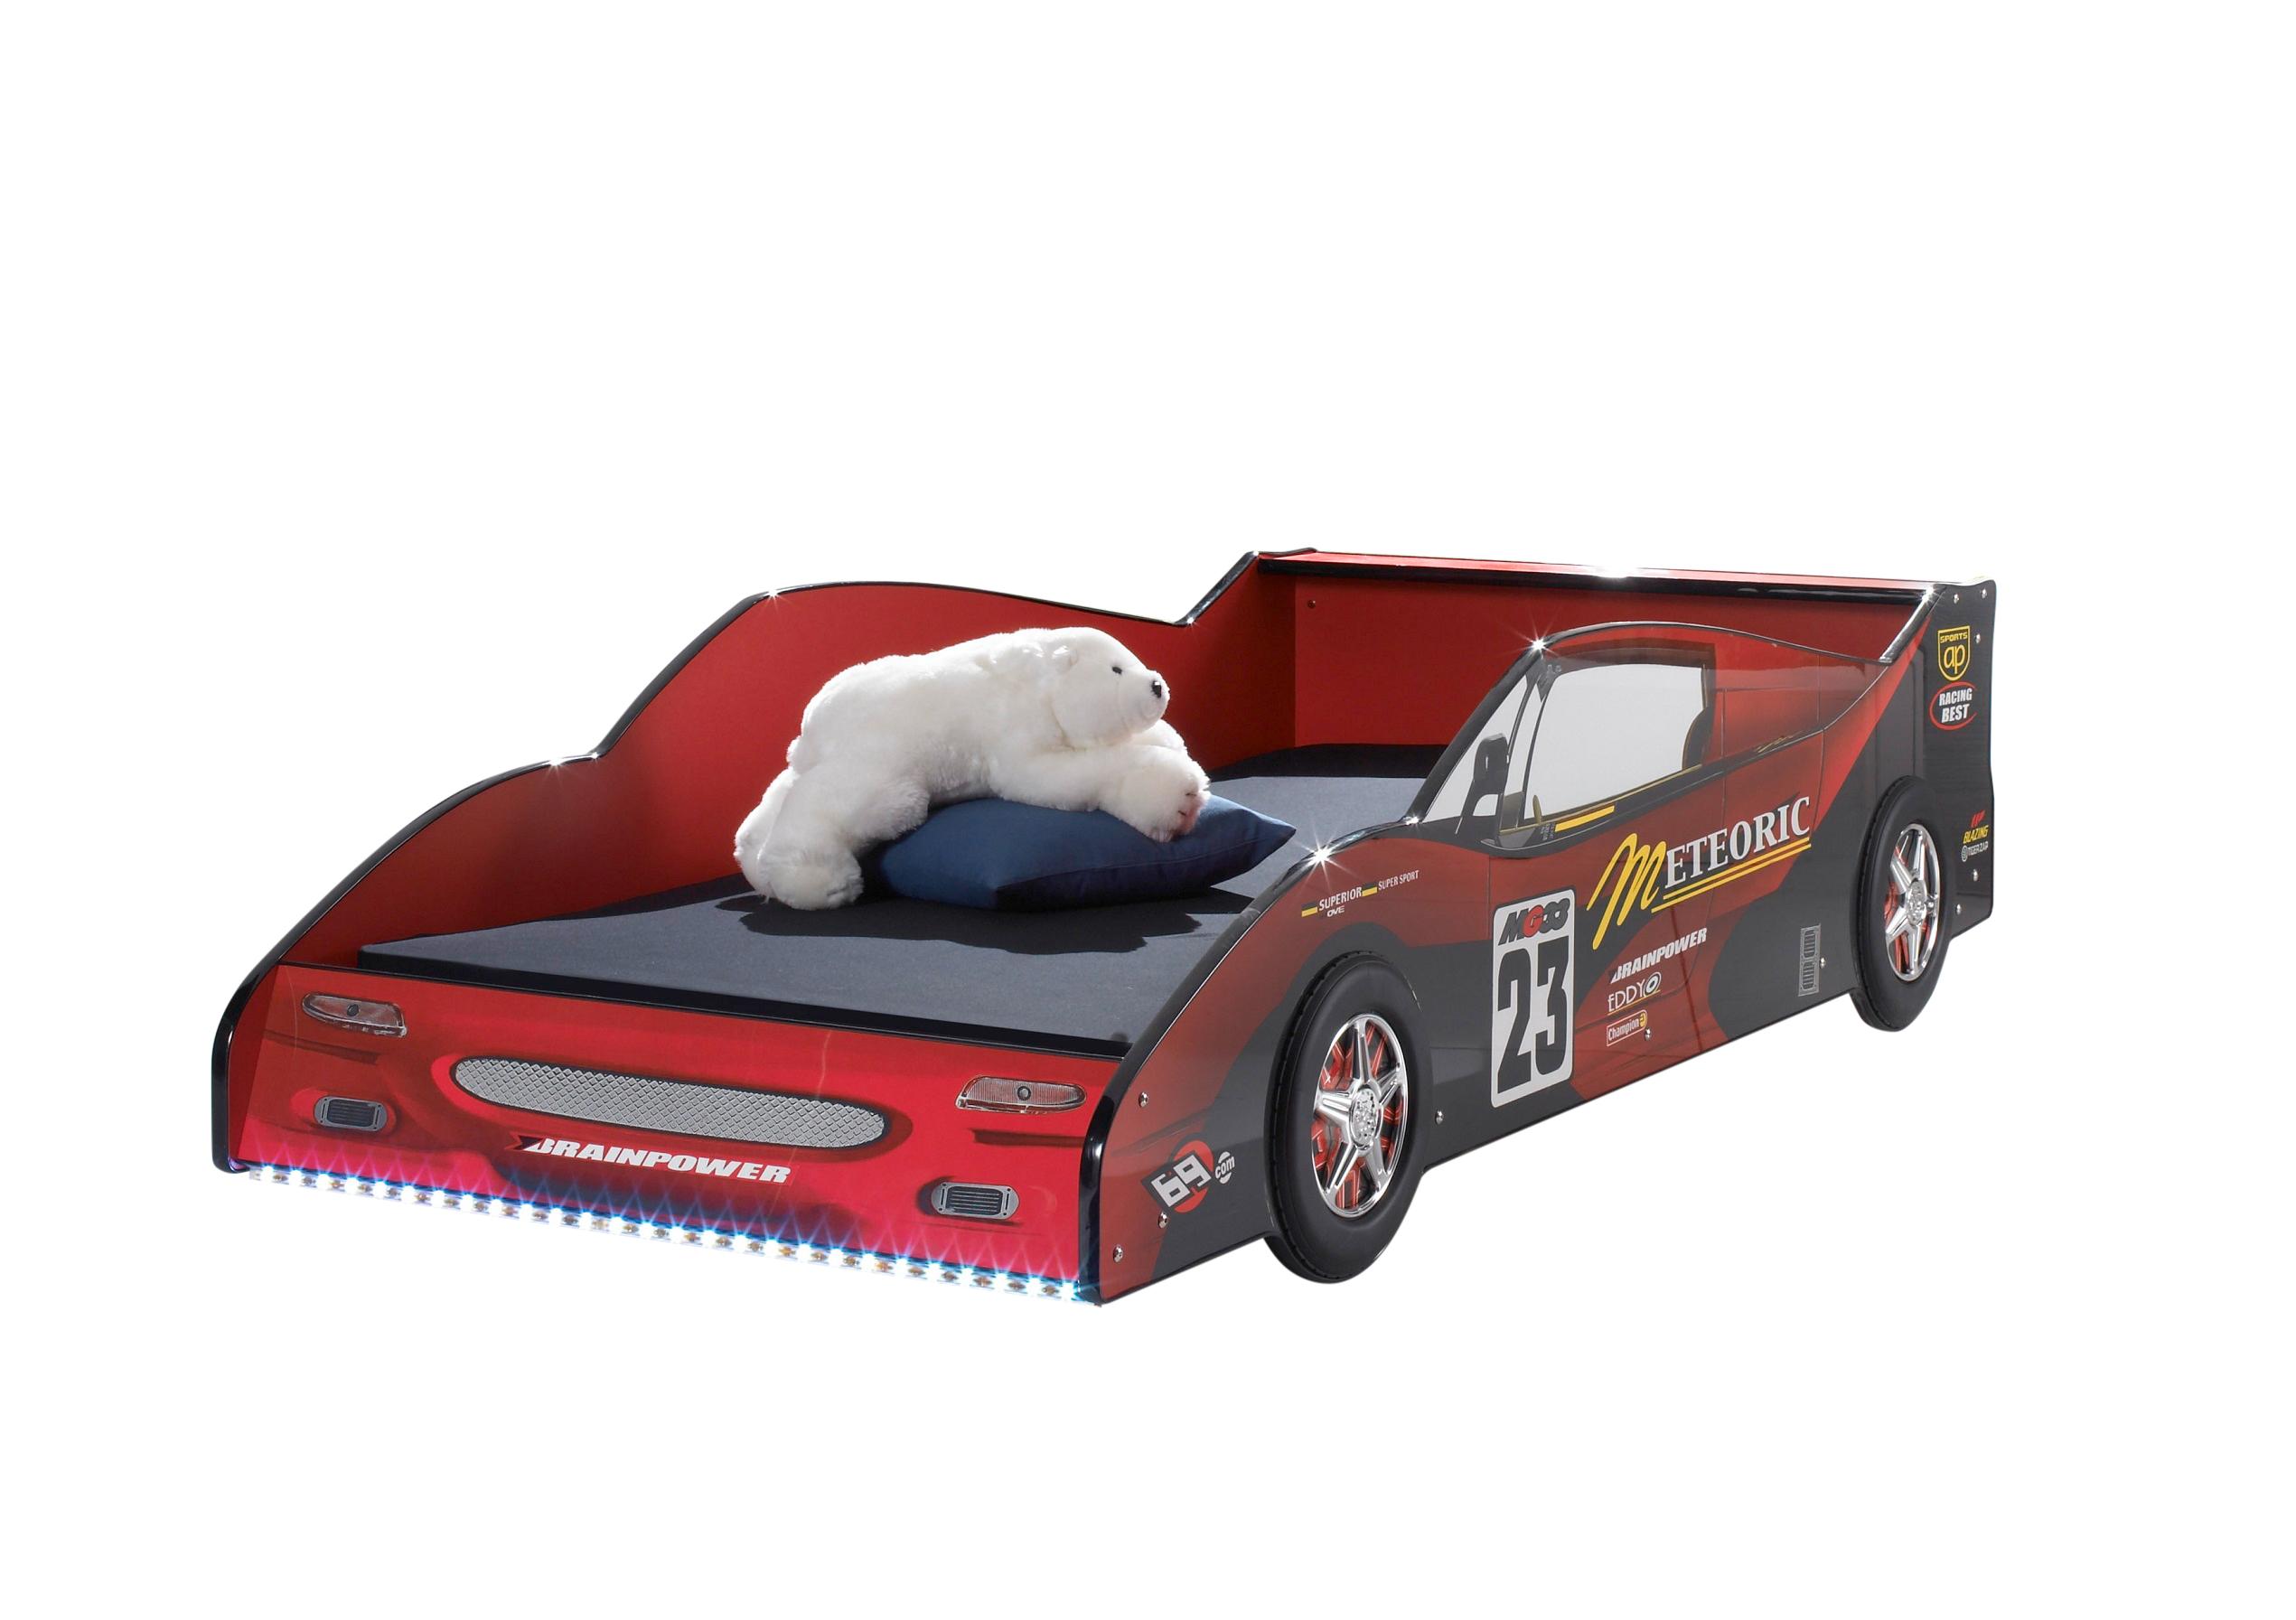 Autobett Racer 90*200 cm Rot Hochglanz mit MDF-Füllung inklusive LED-Beleuchtung